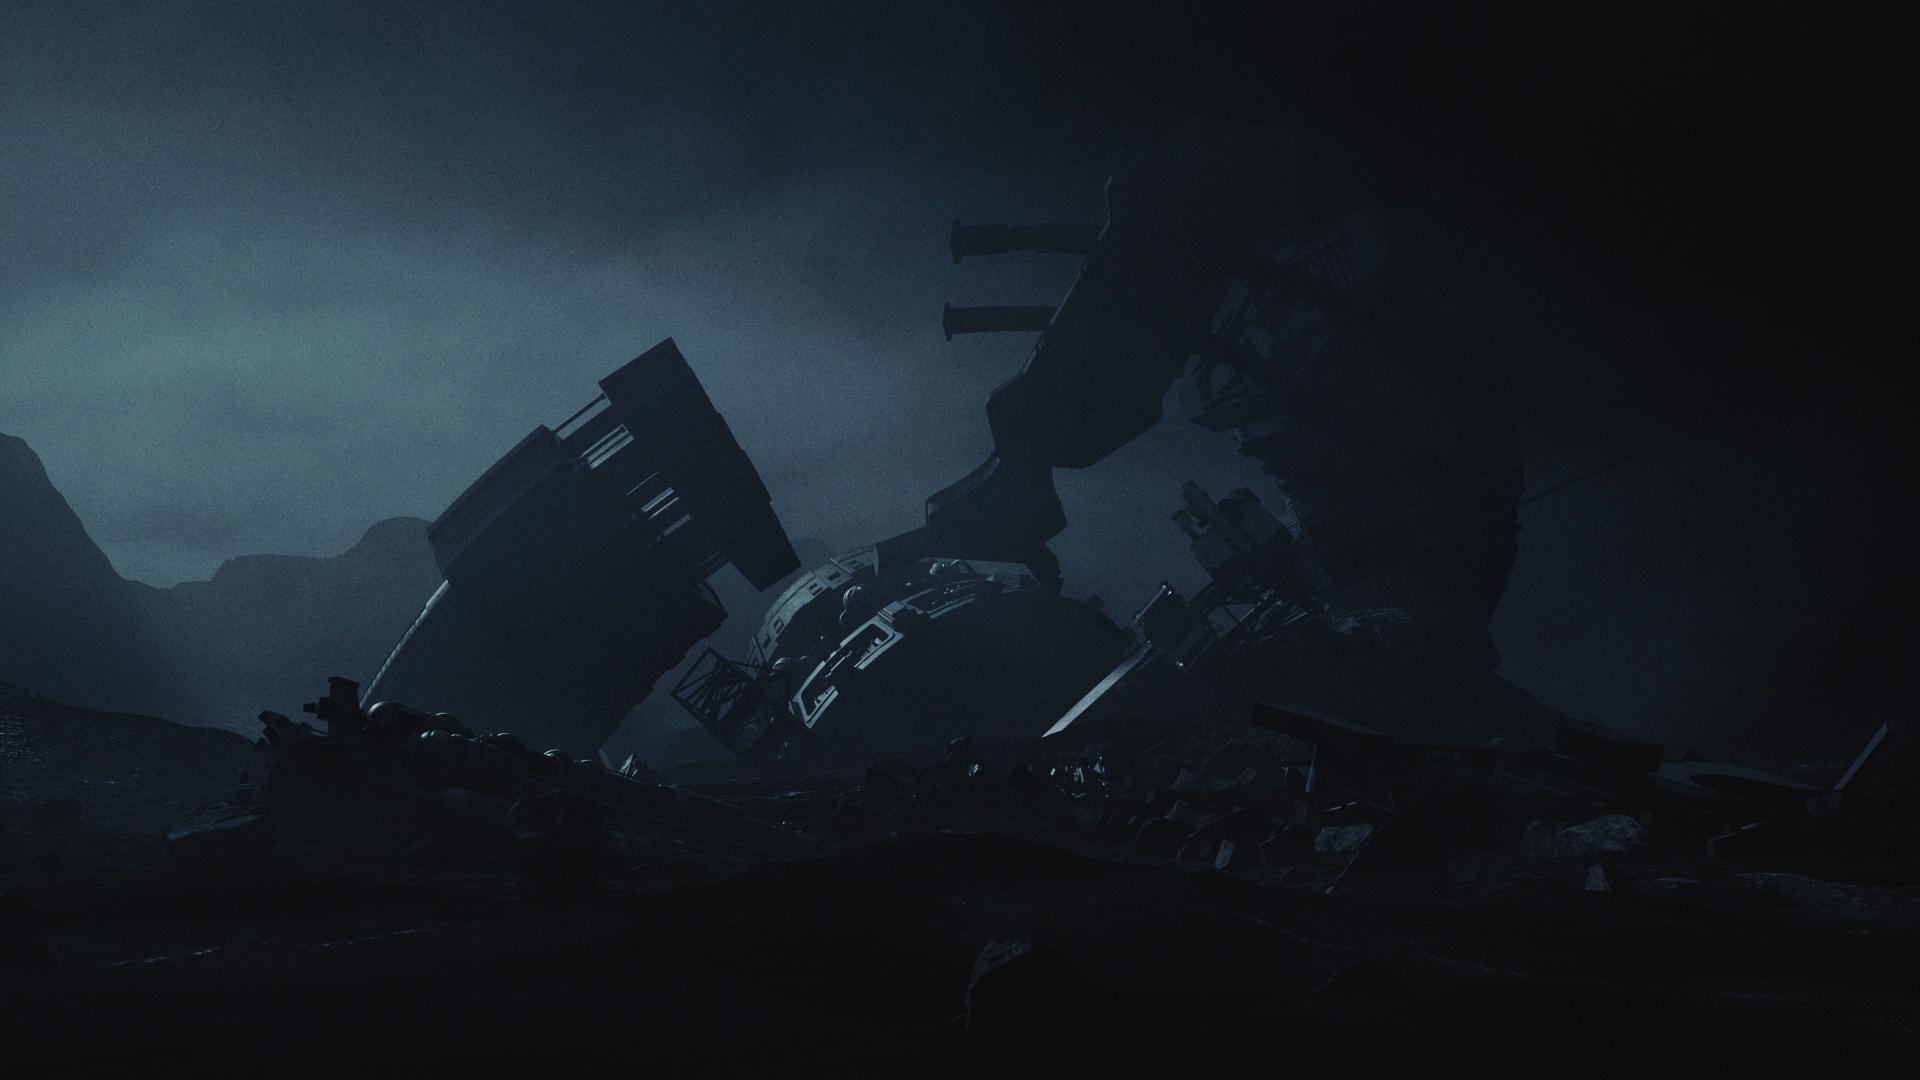 Corners-Wreckage-Still.png